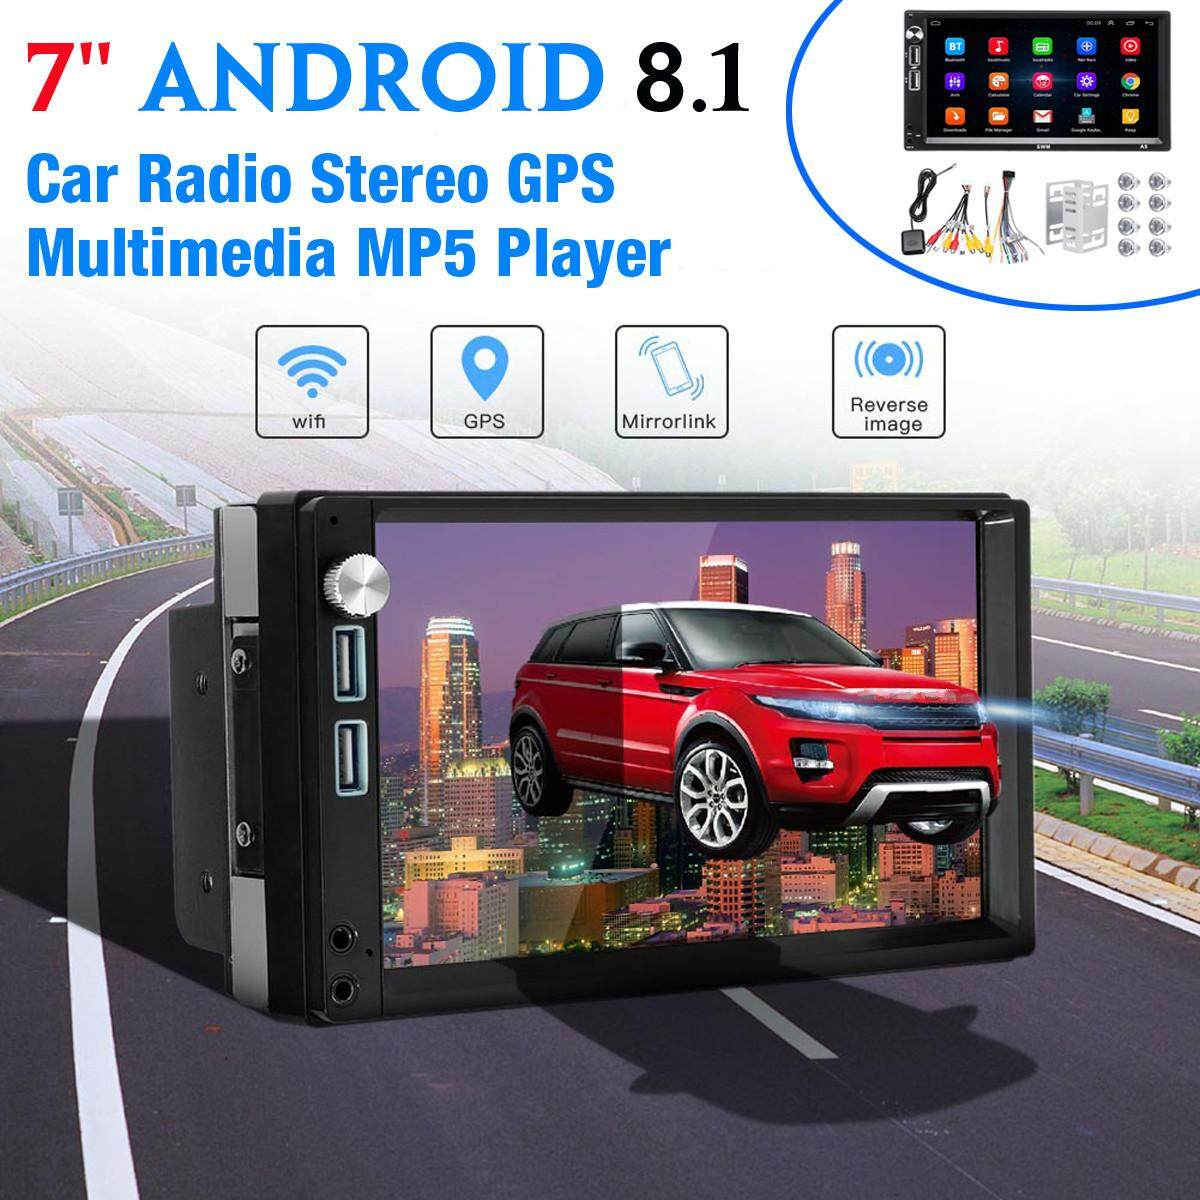 Swm-A5 7inch Android 8.1 Car Radio Stereo Gps Mavigation Multimedia Mp5 Player By Haldis.